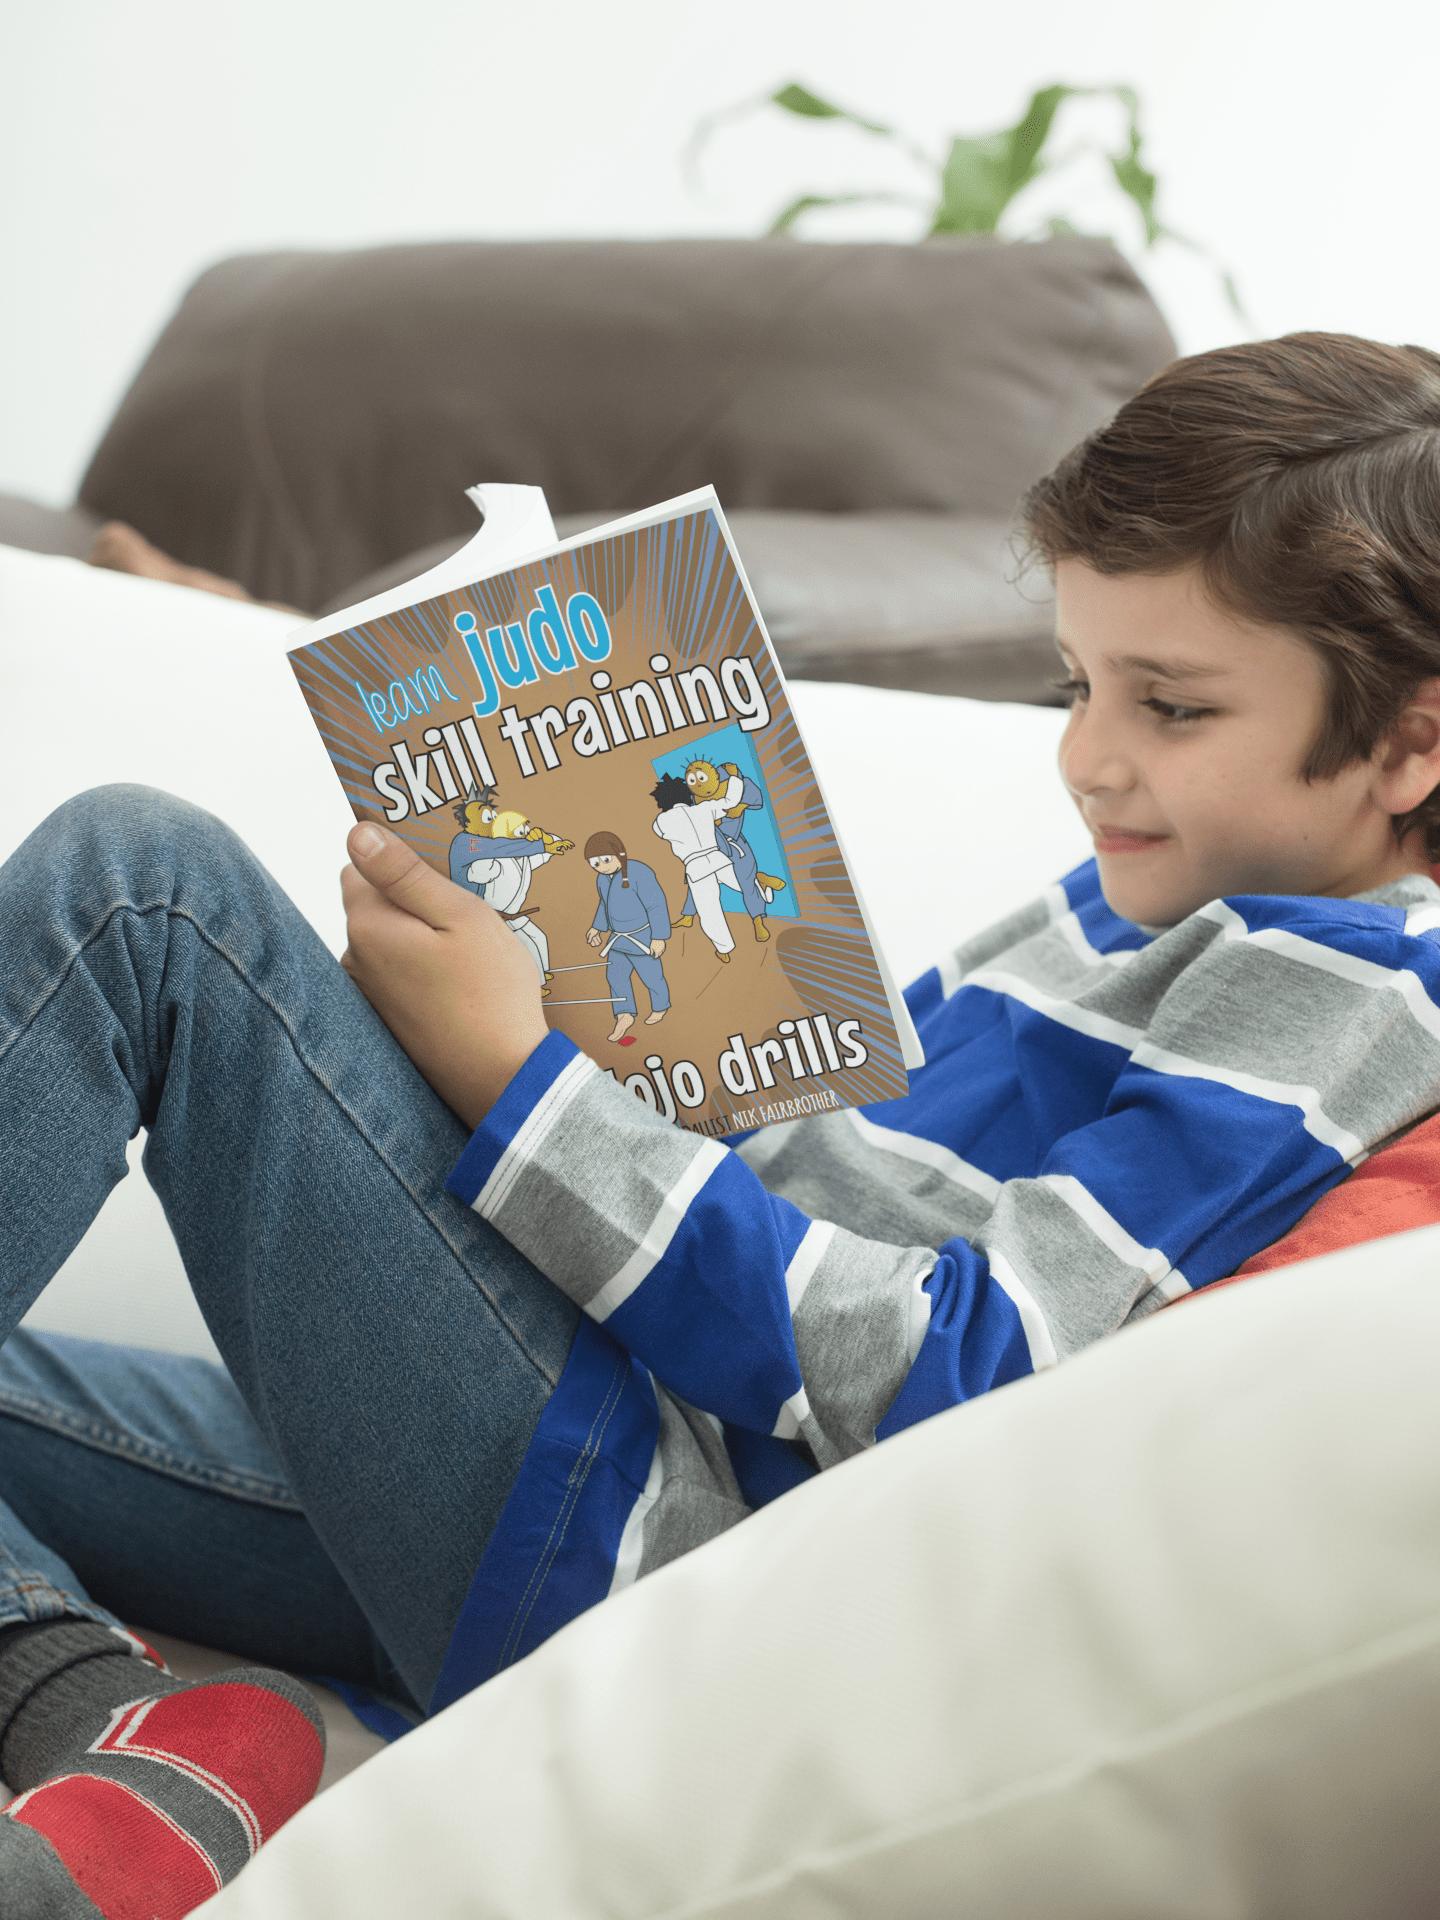 judoka reading koka kids judo book